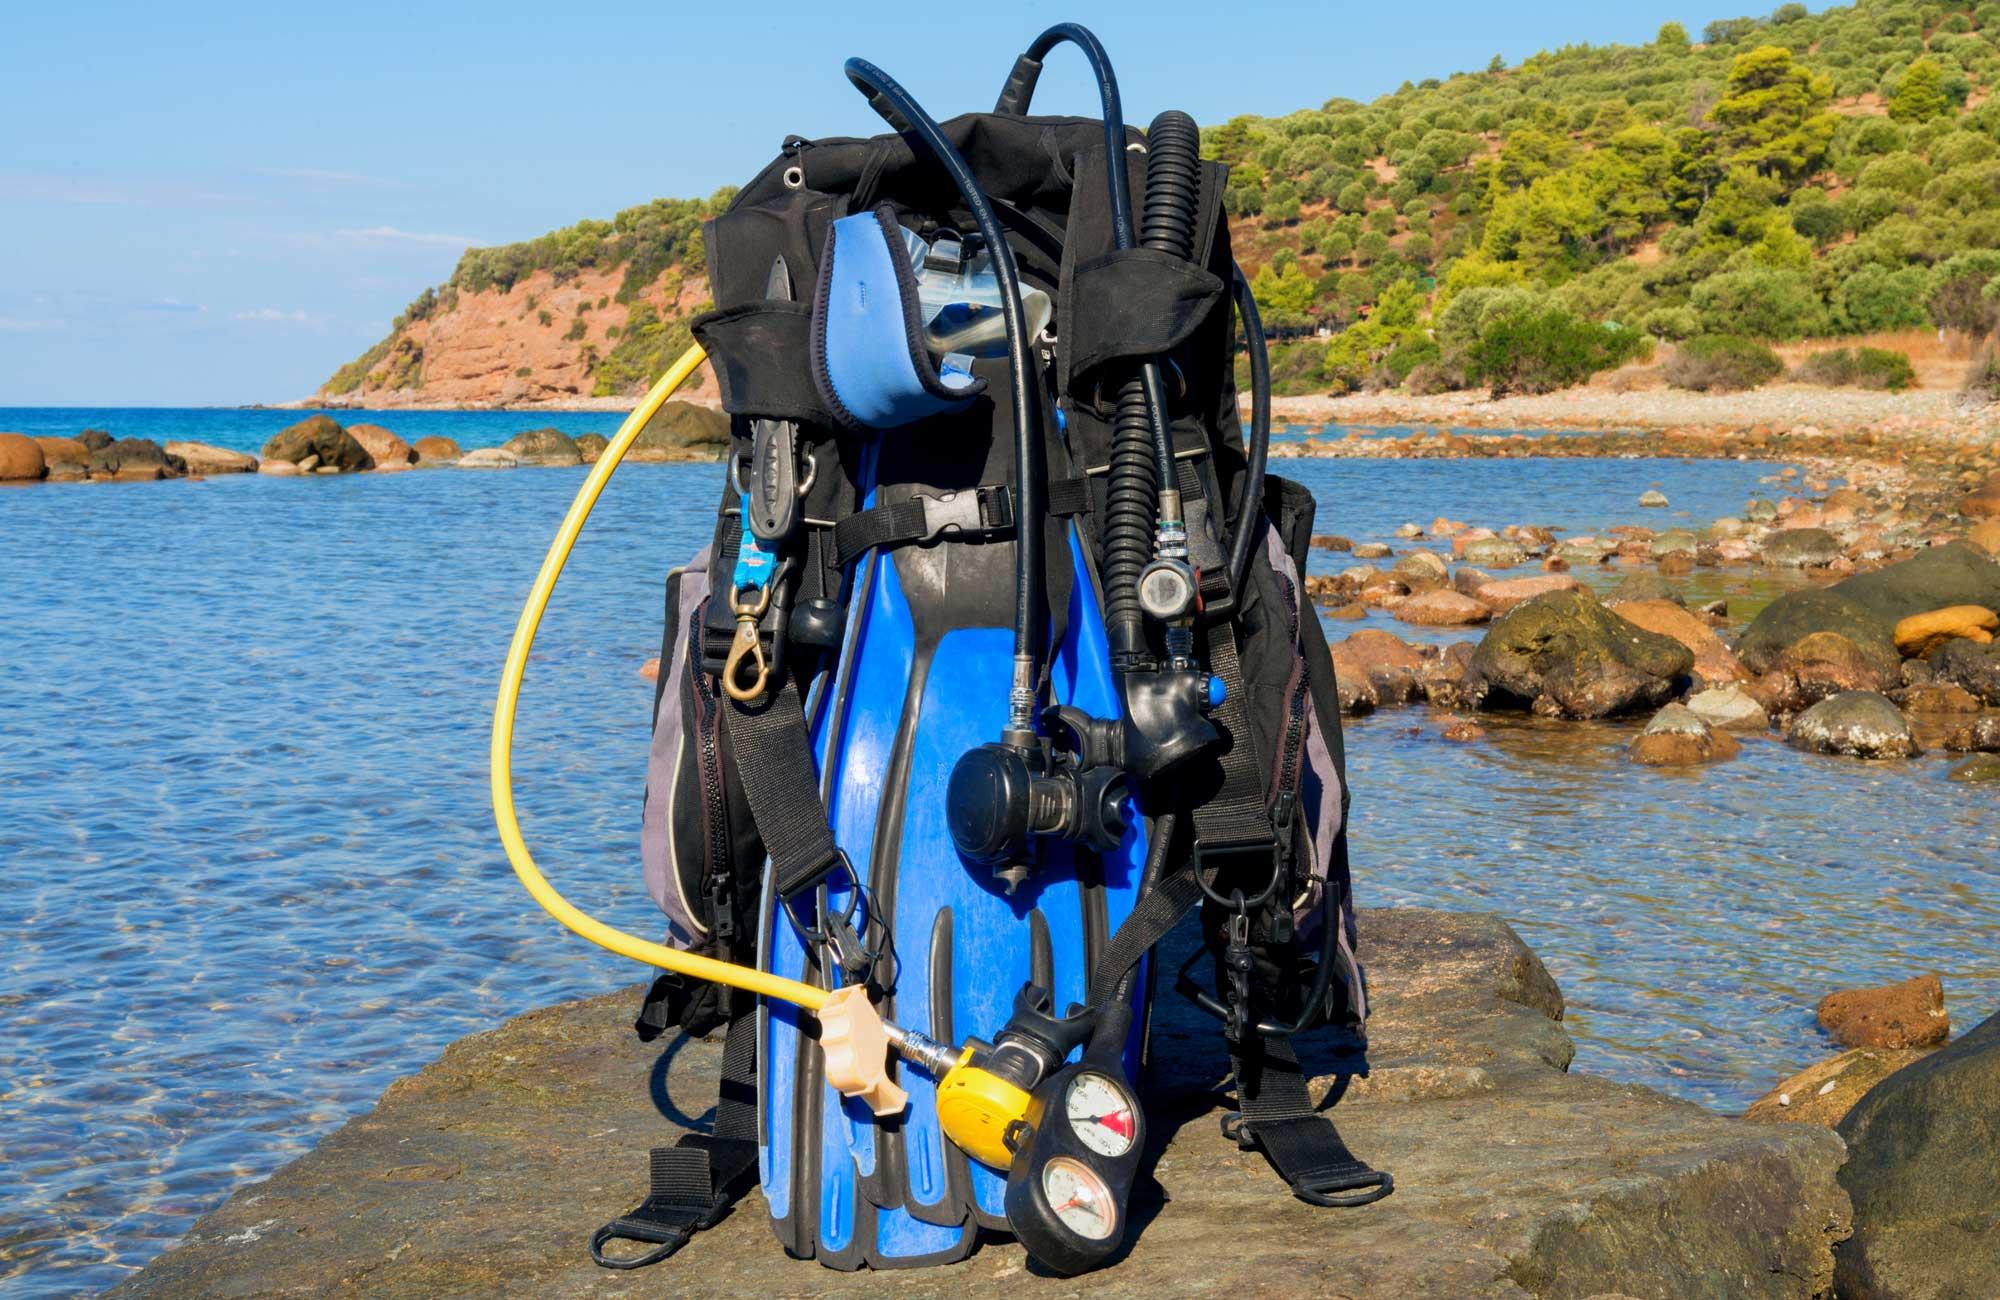 6 Best Scuba Diving Gear Packages